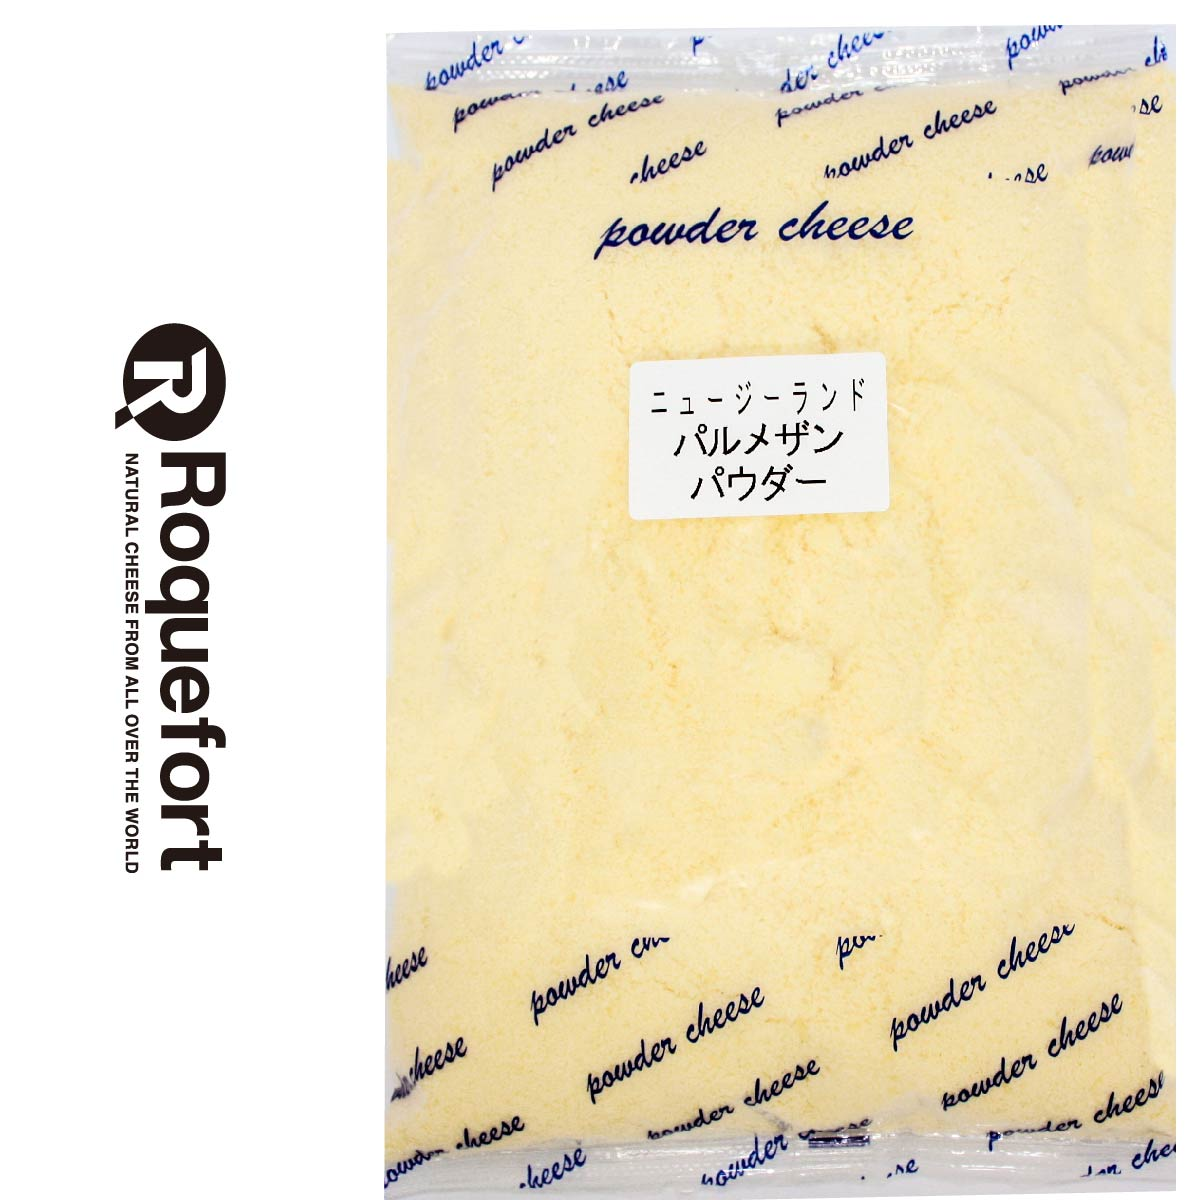 NZパルメザン チーズ 100%パウダー 1kg|ニュージーランド・業務用・パウダーチーズ・チーズ専門店